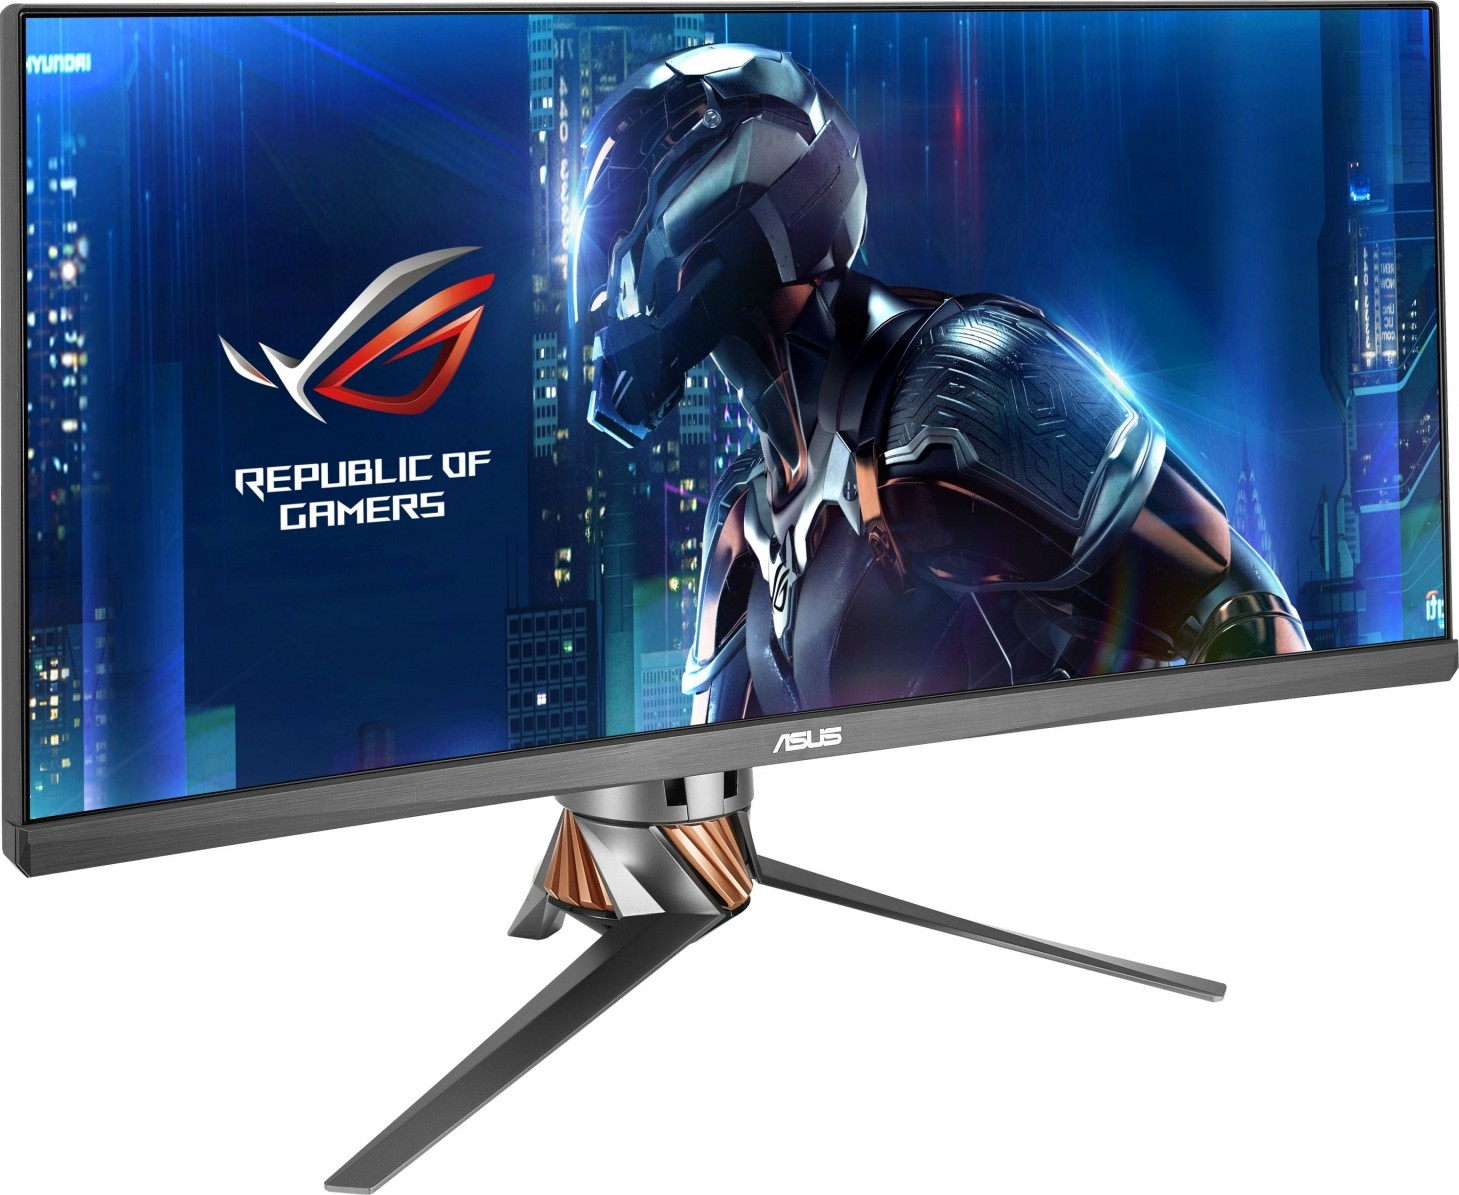 "Asus ROG Swift PG27UQ Gaming Monitor (27"" 4K UHD (3840 x 2160) Overclockable 144Hz G-SYNC HDR Quantum-dot IPS Aura Sync) | PG27UQ Buy, Best ..."